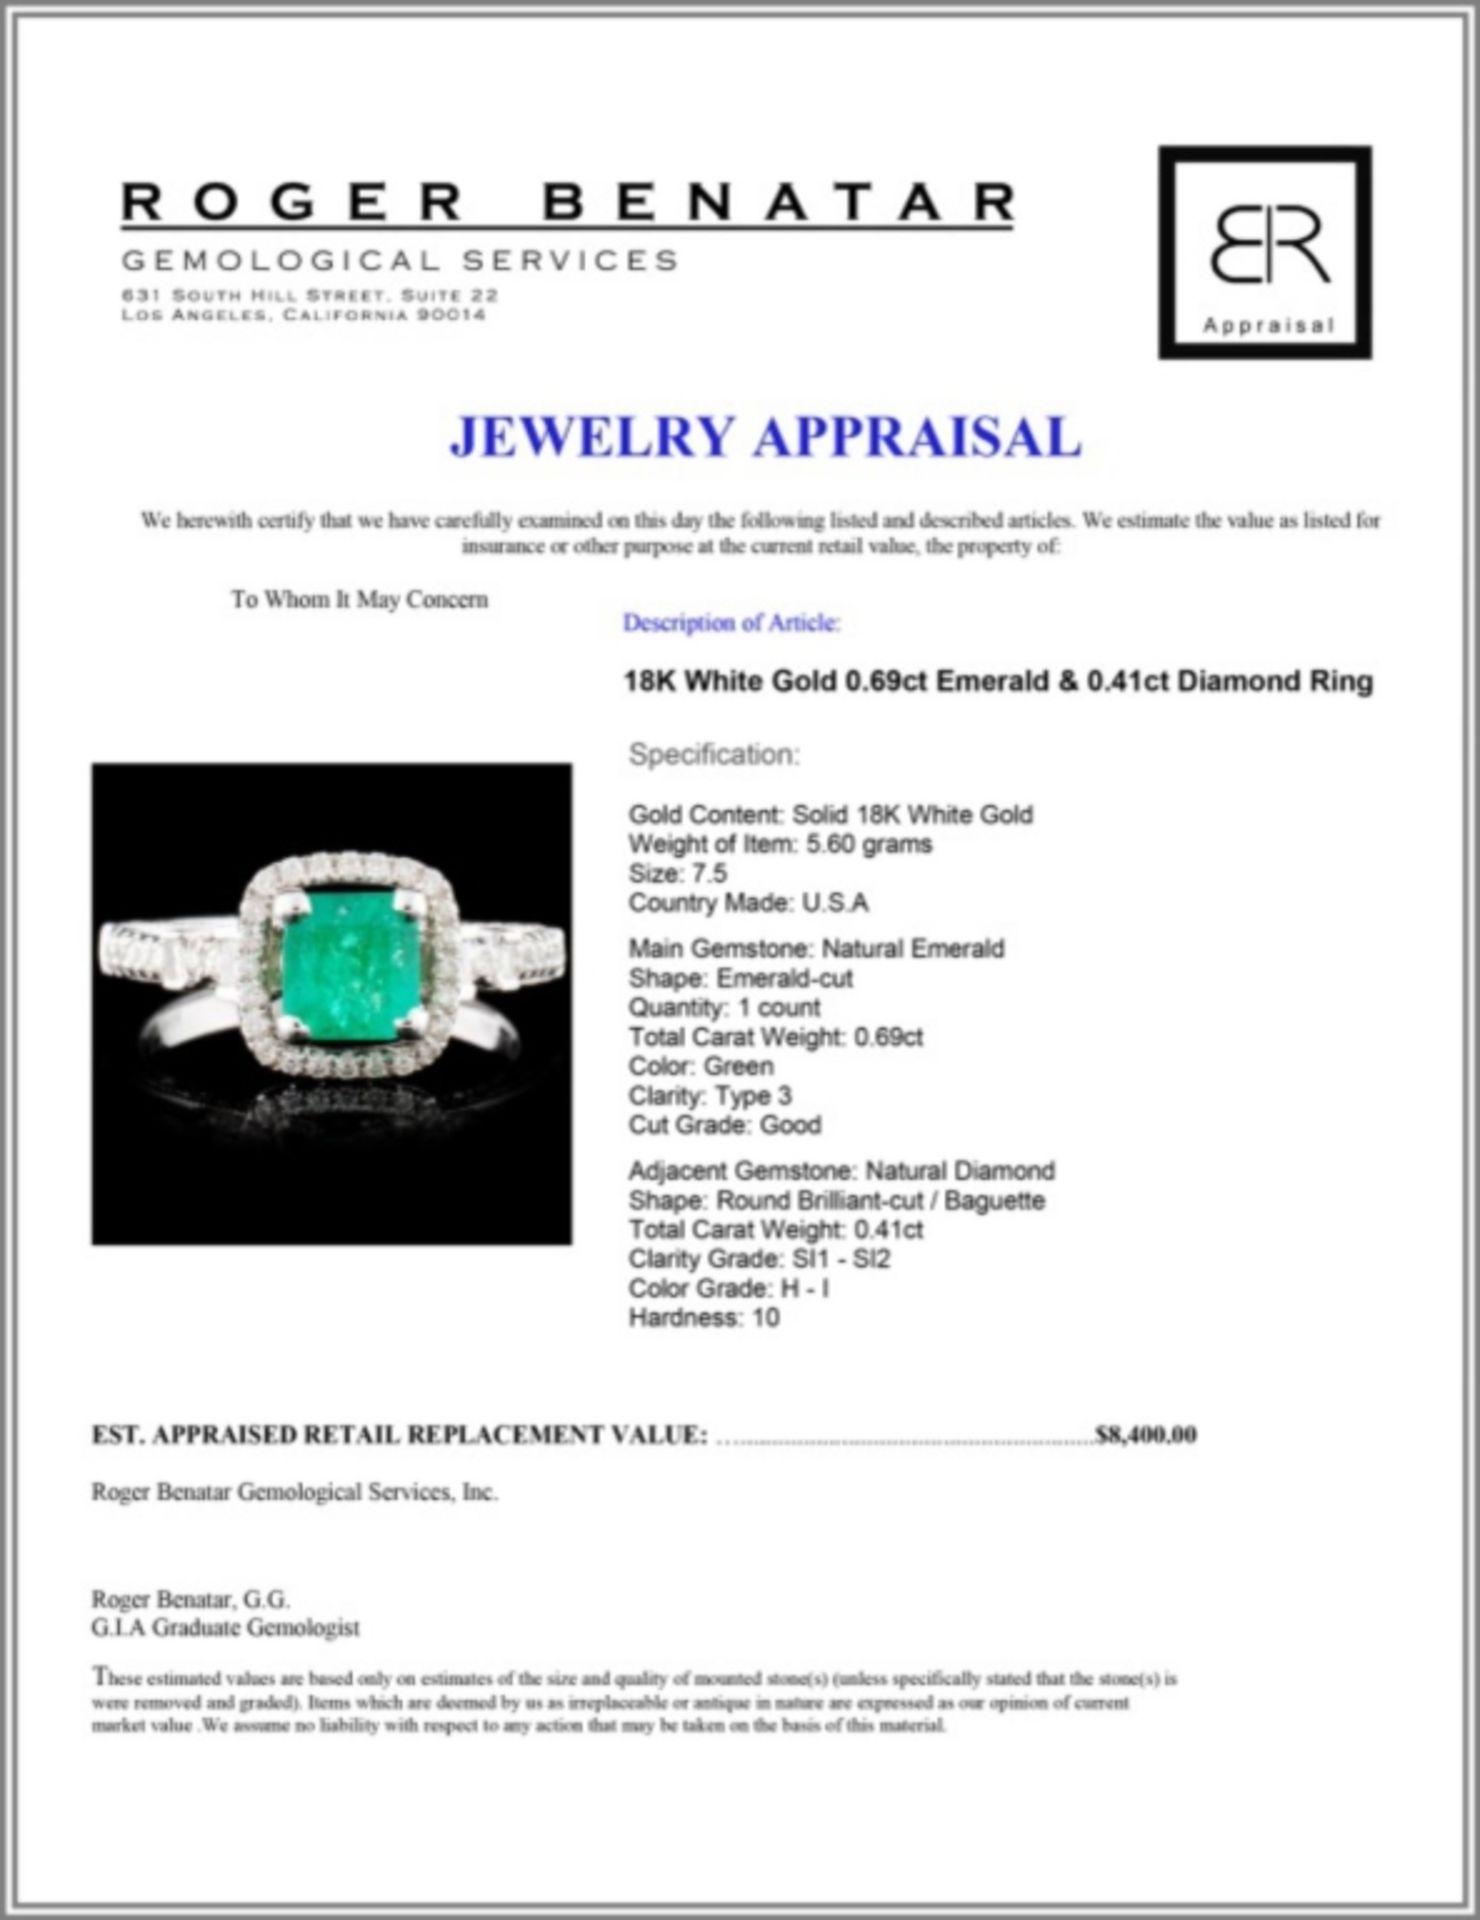 18K White Gold 0.69ct Emerald & 0.41ct Diamond Rin - Image 4 of 4